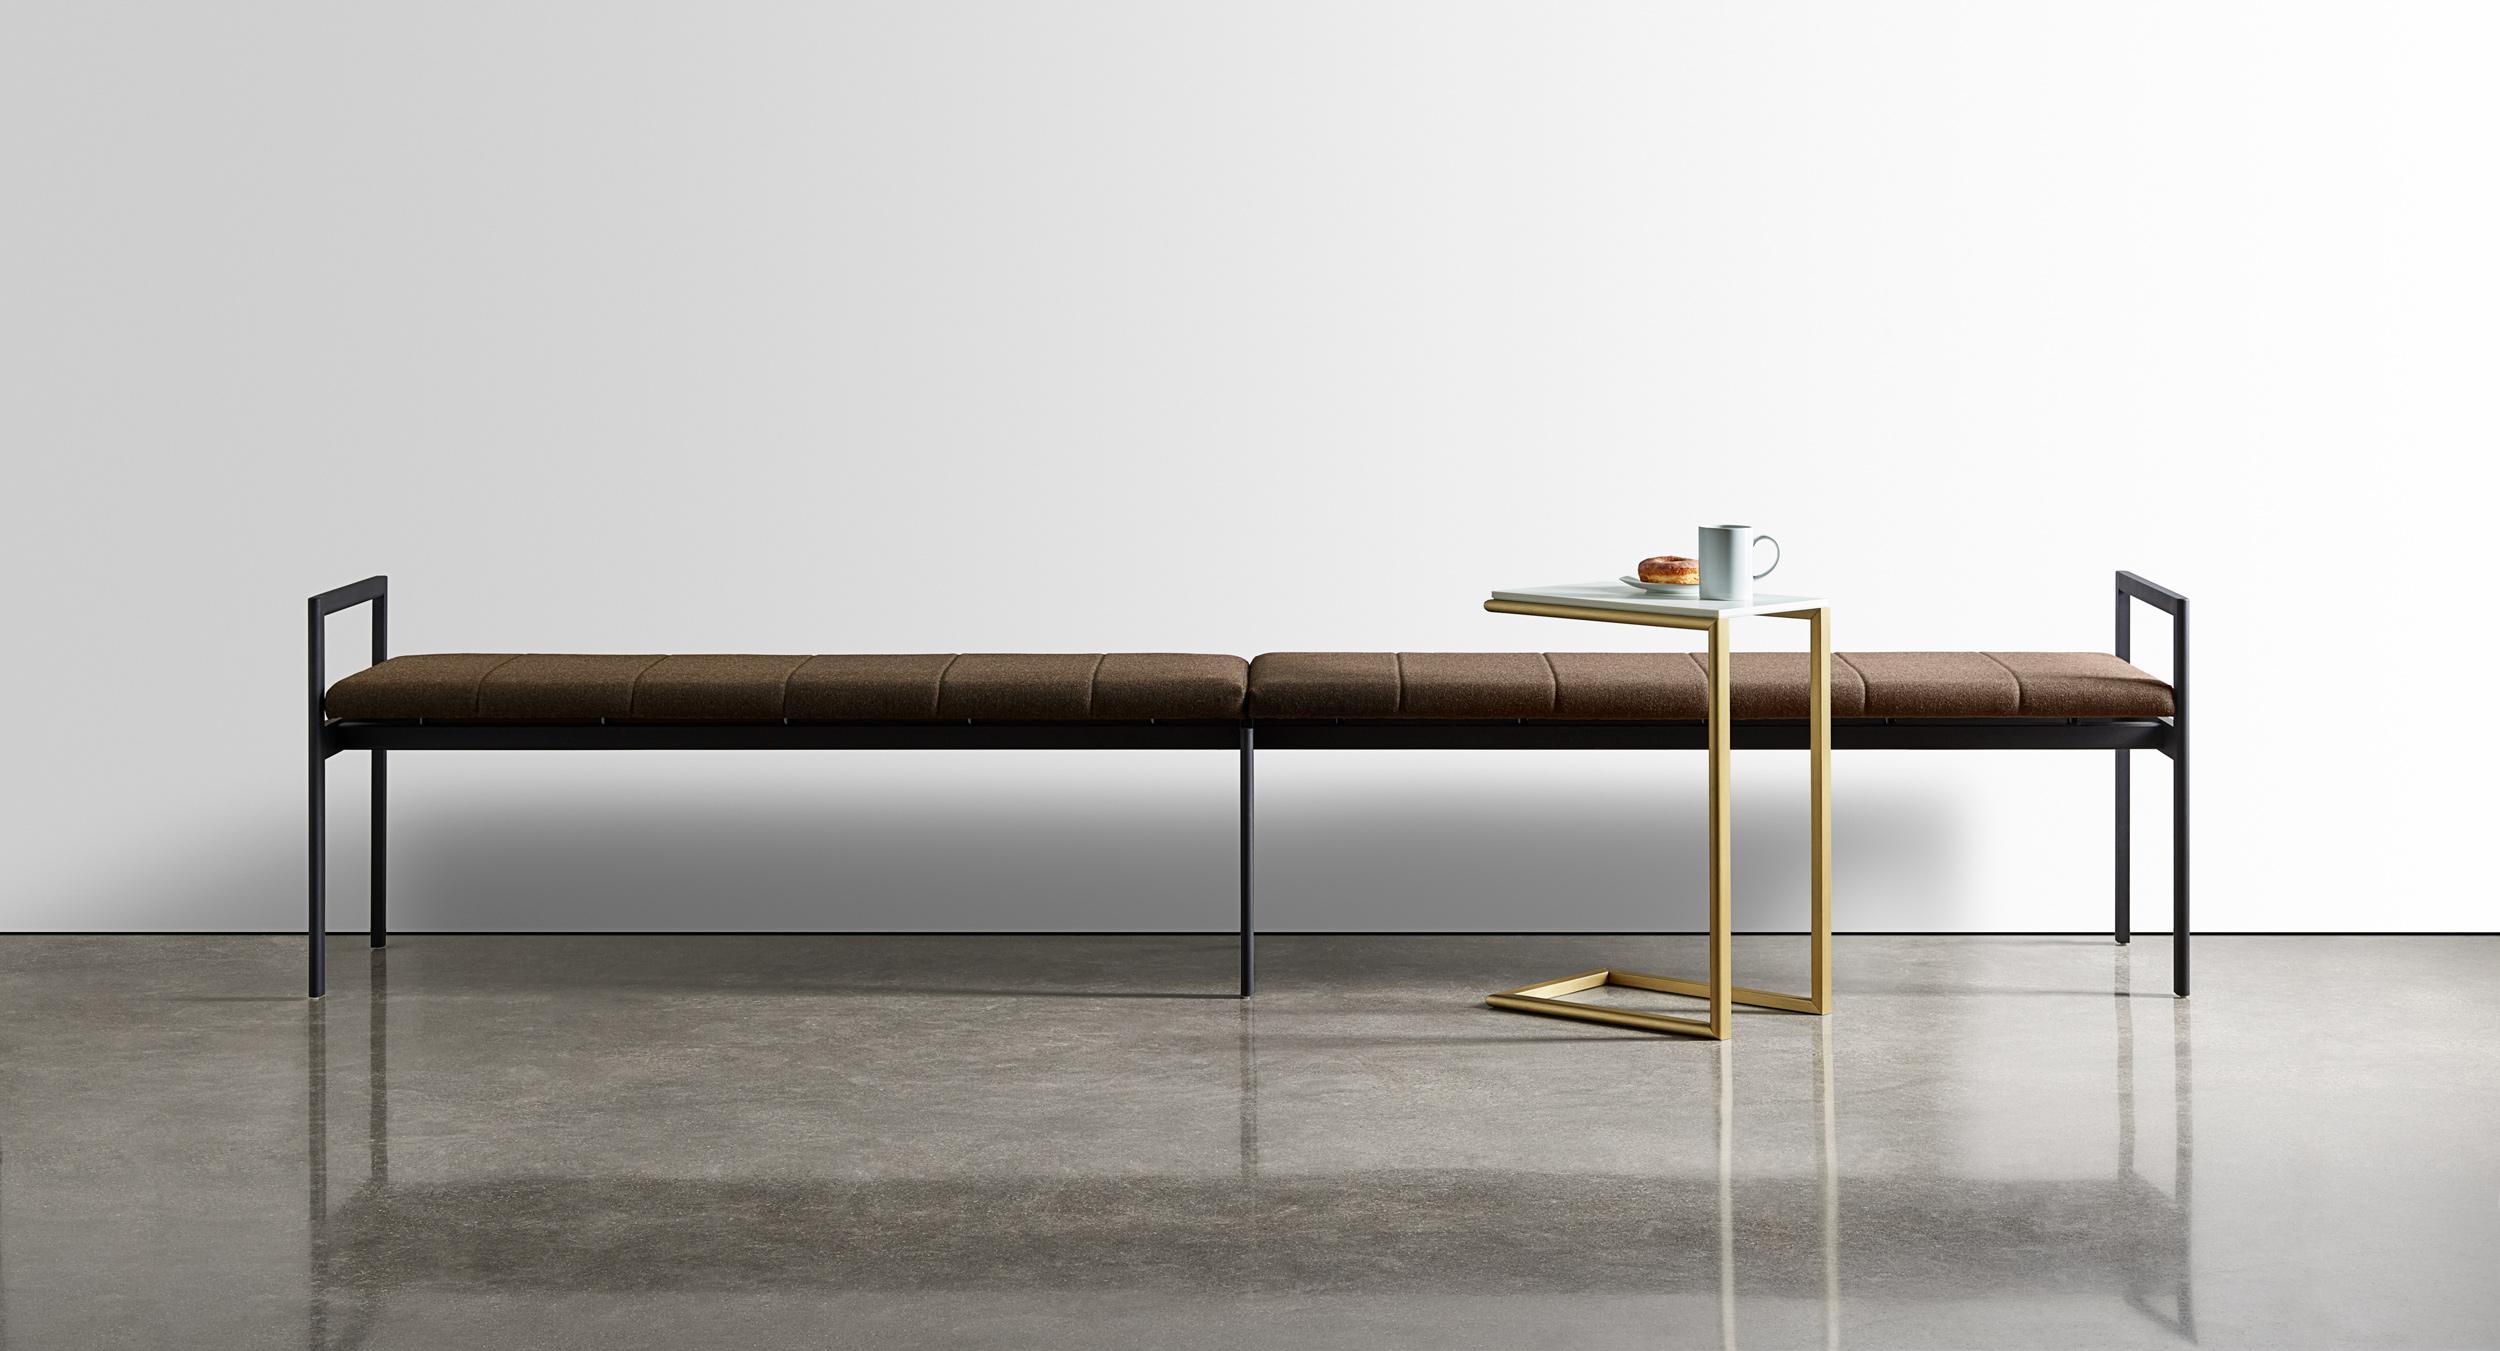 Halo HALCON Furniture - Corian conference table